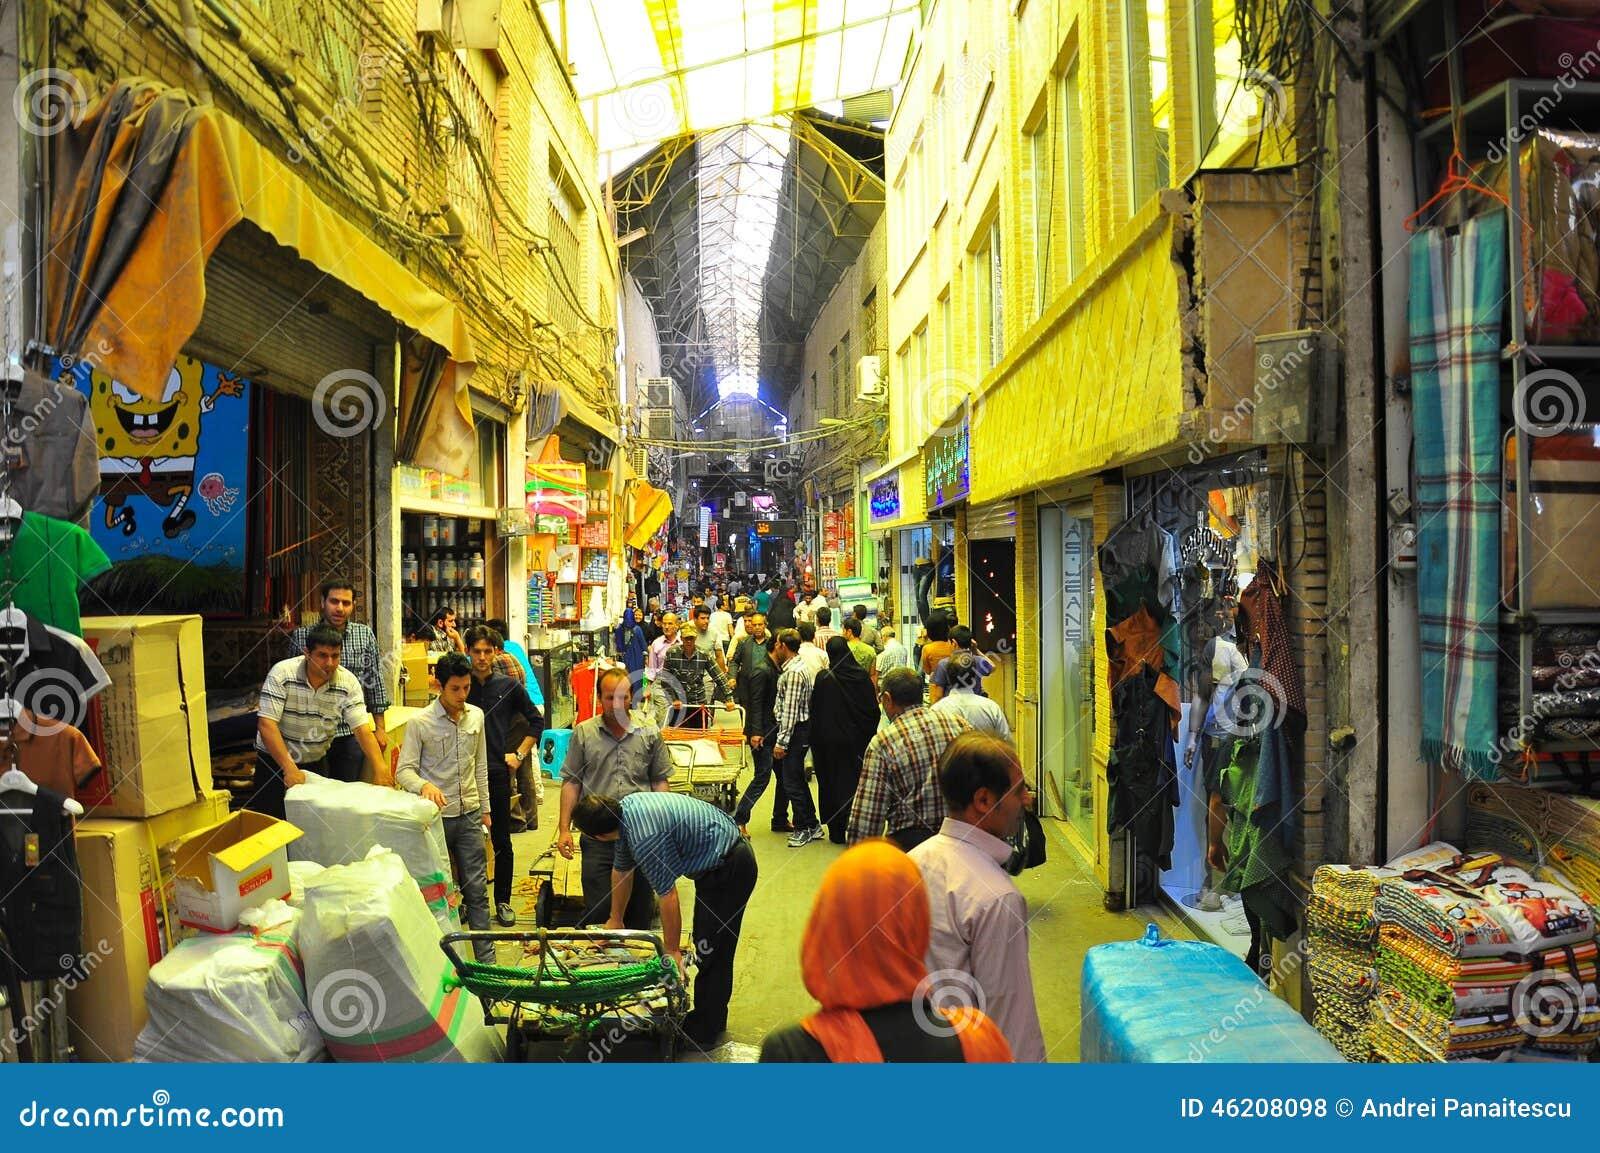 Download TEHRAN BAAZAR editorial stock photo. Image of light, baazar - 46208098